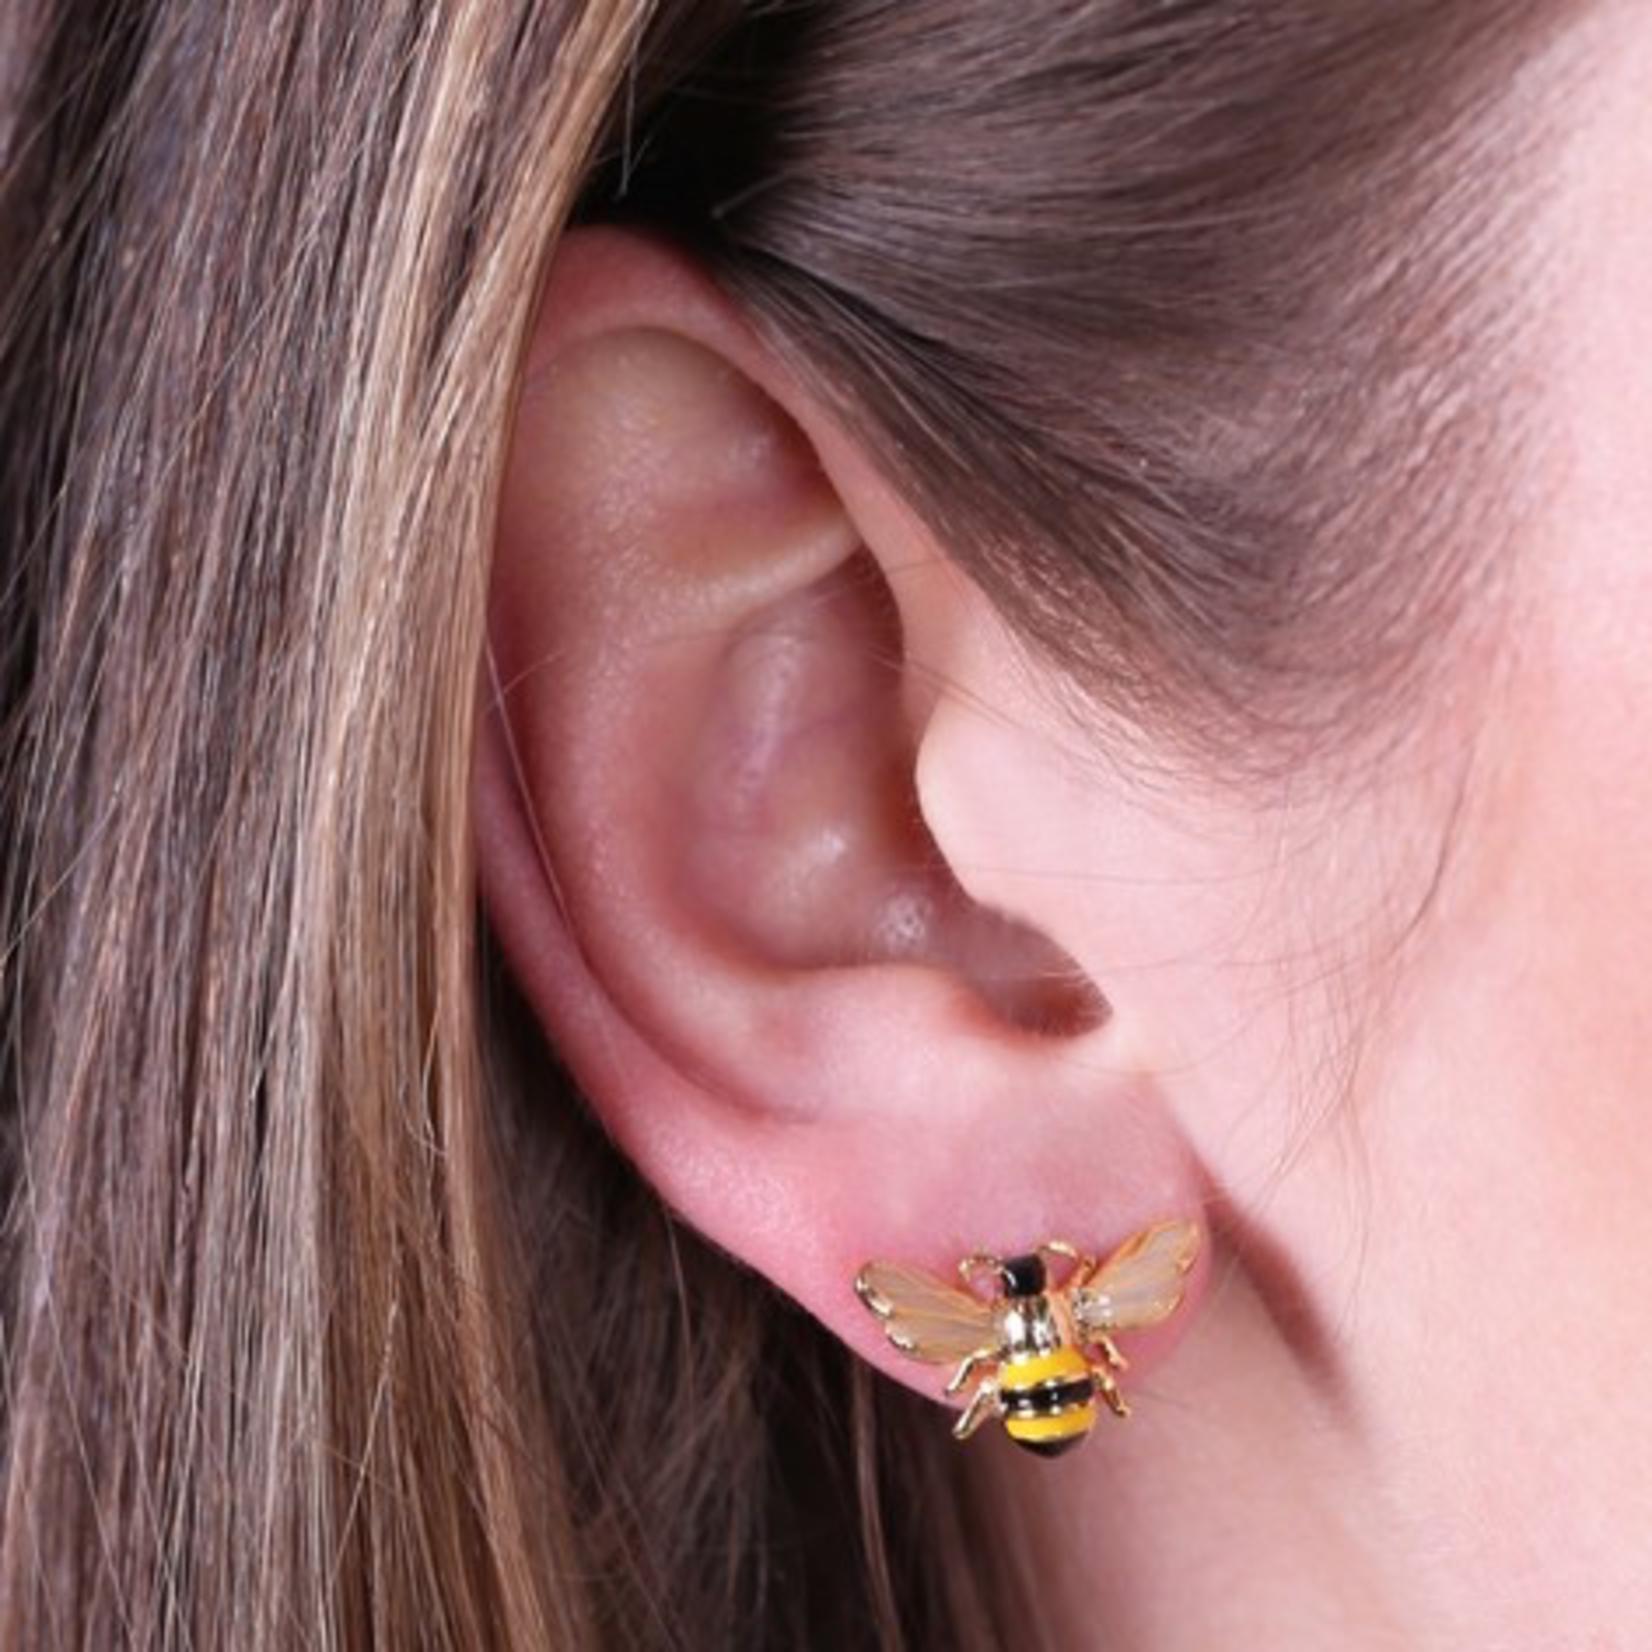 Lisa Angel Bumble Bee Gold Stud Earrings